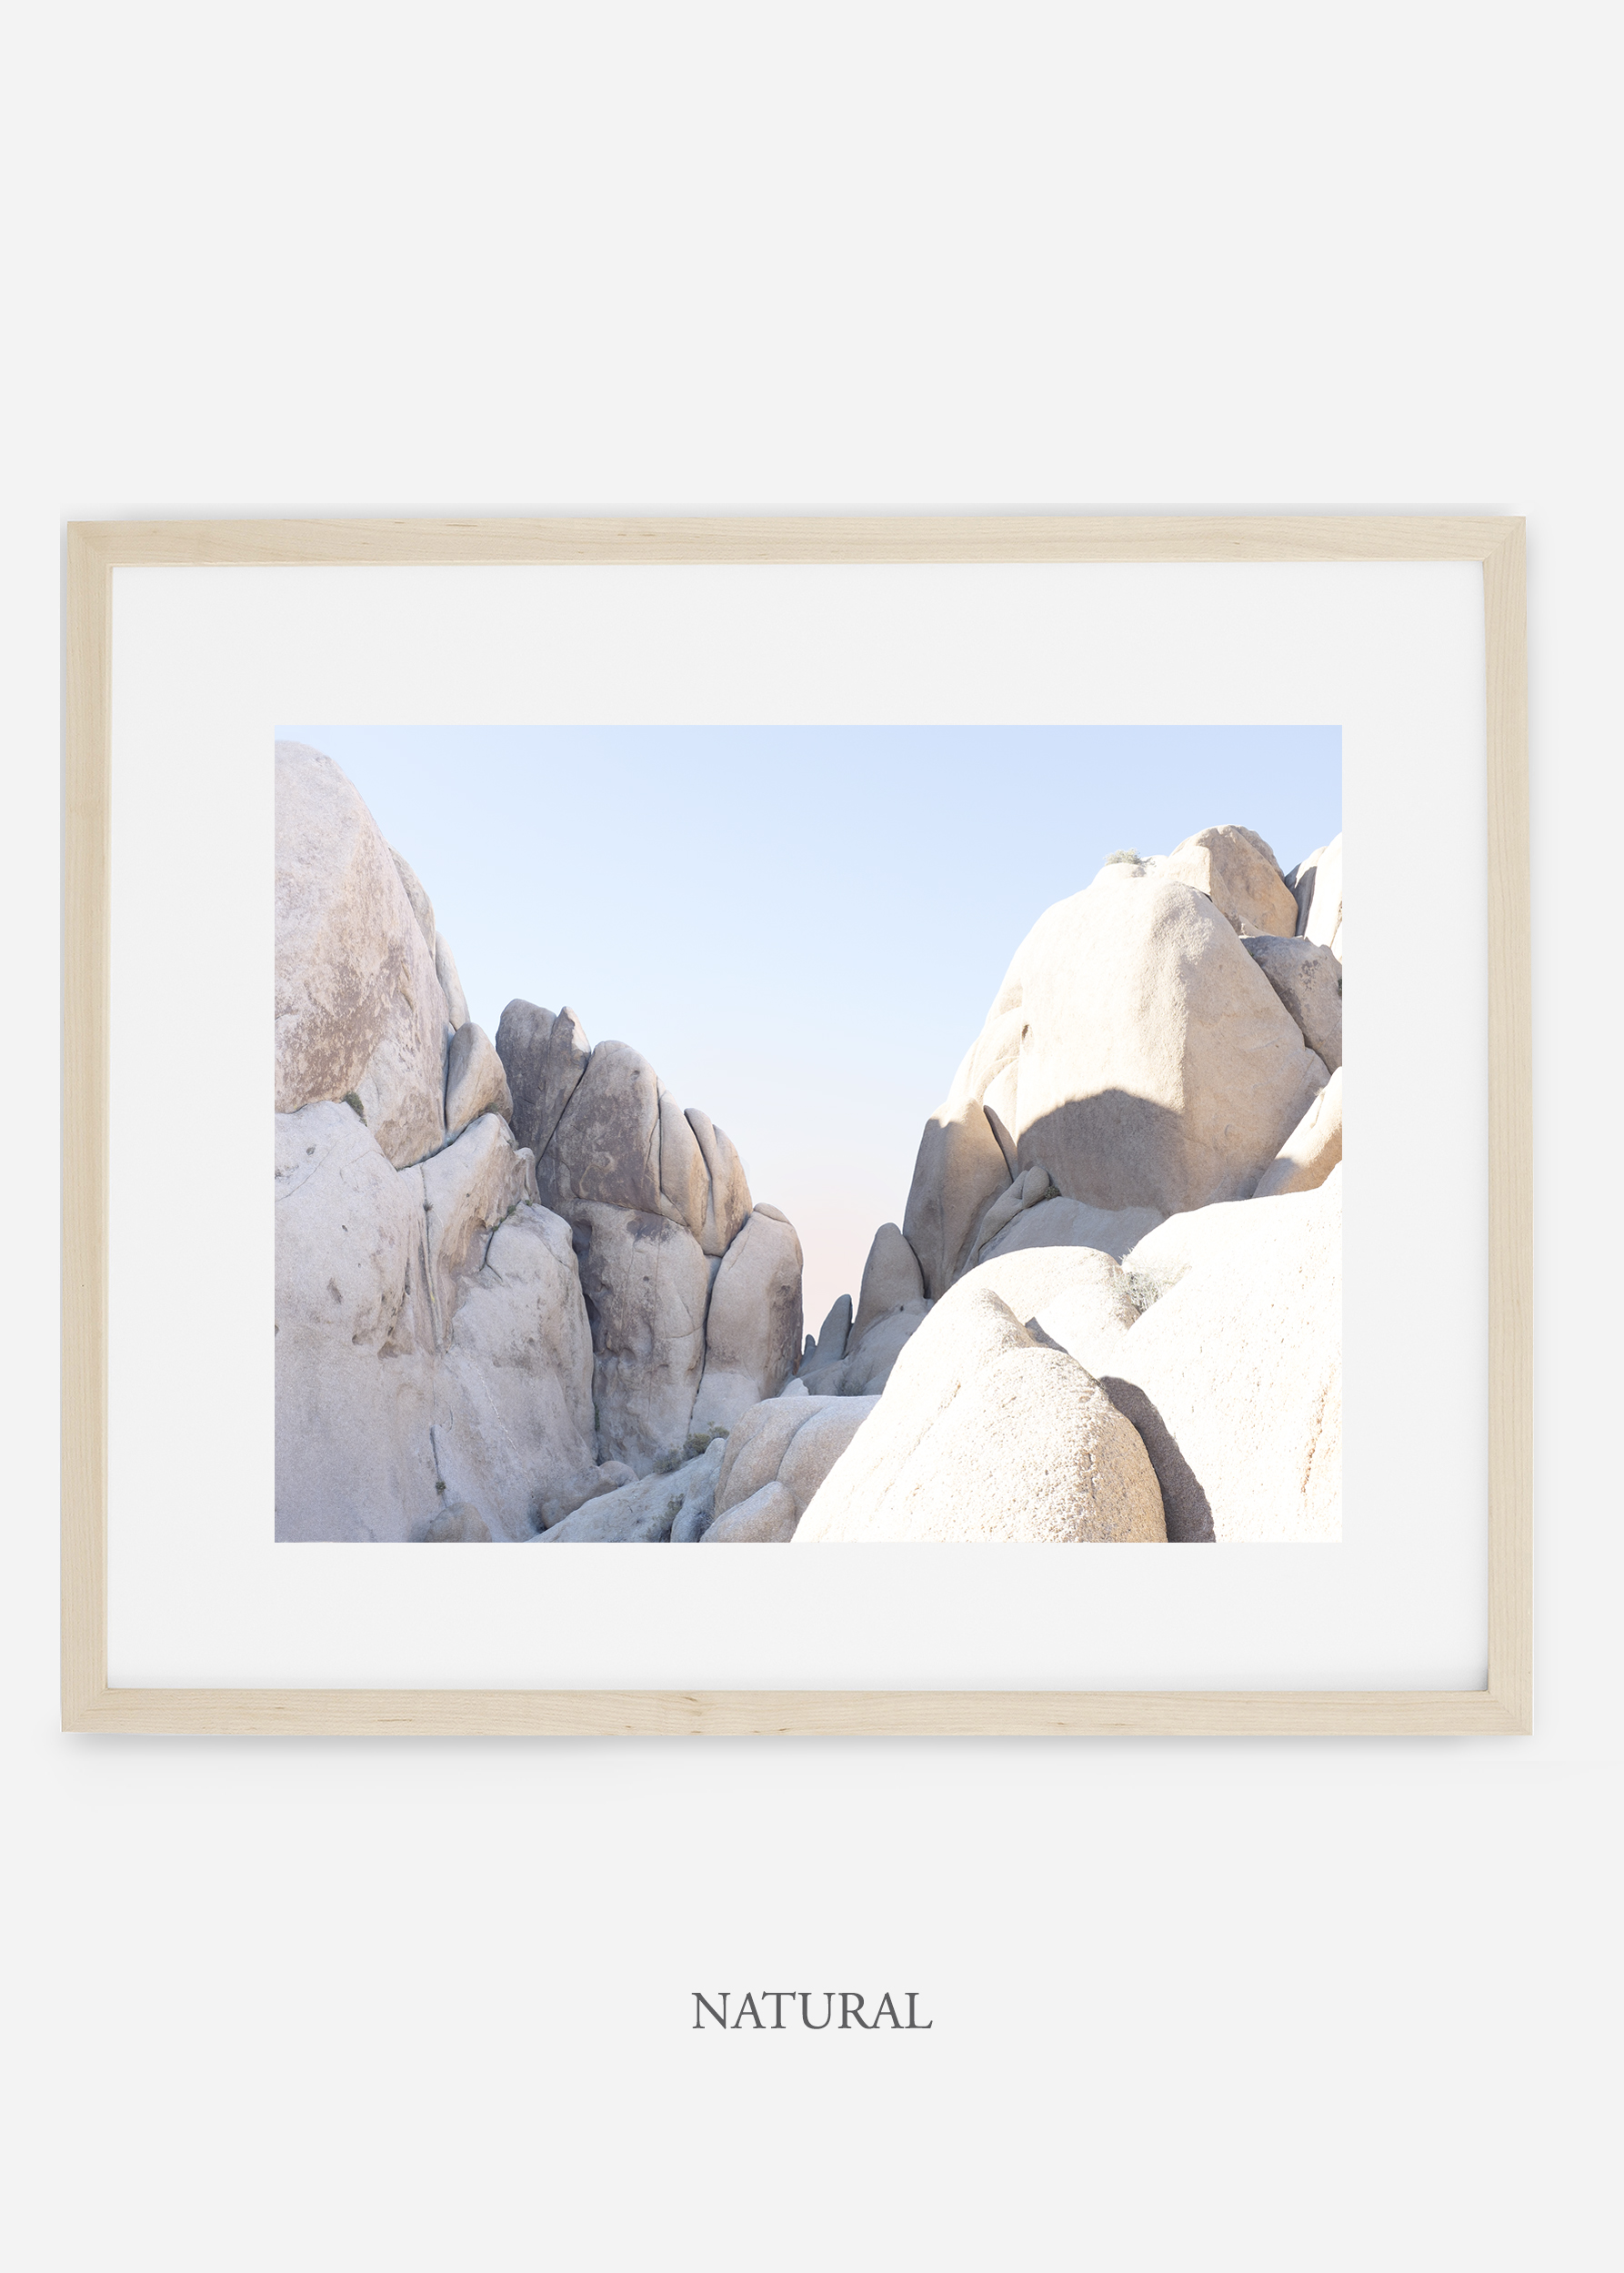 WilderCalifornia_natural_JoshuaTree_No.18_interiordesign_prints_art.jpg